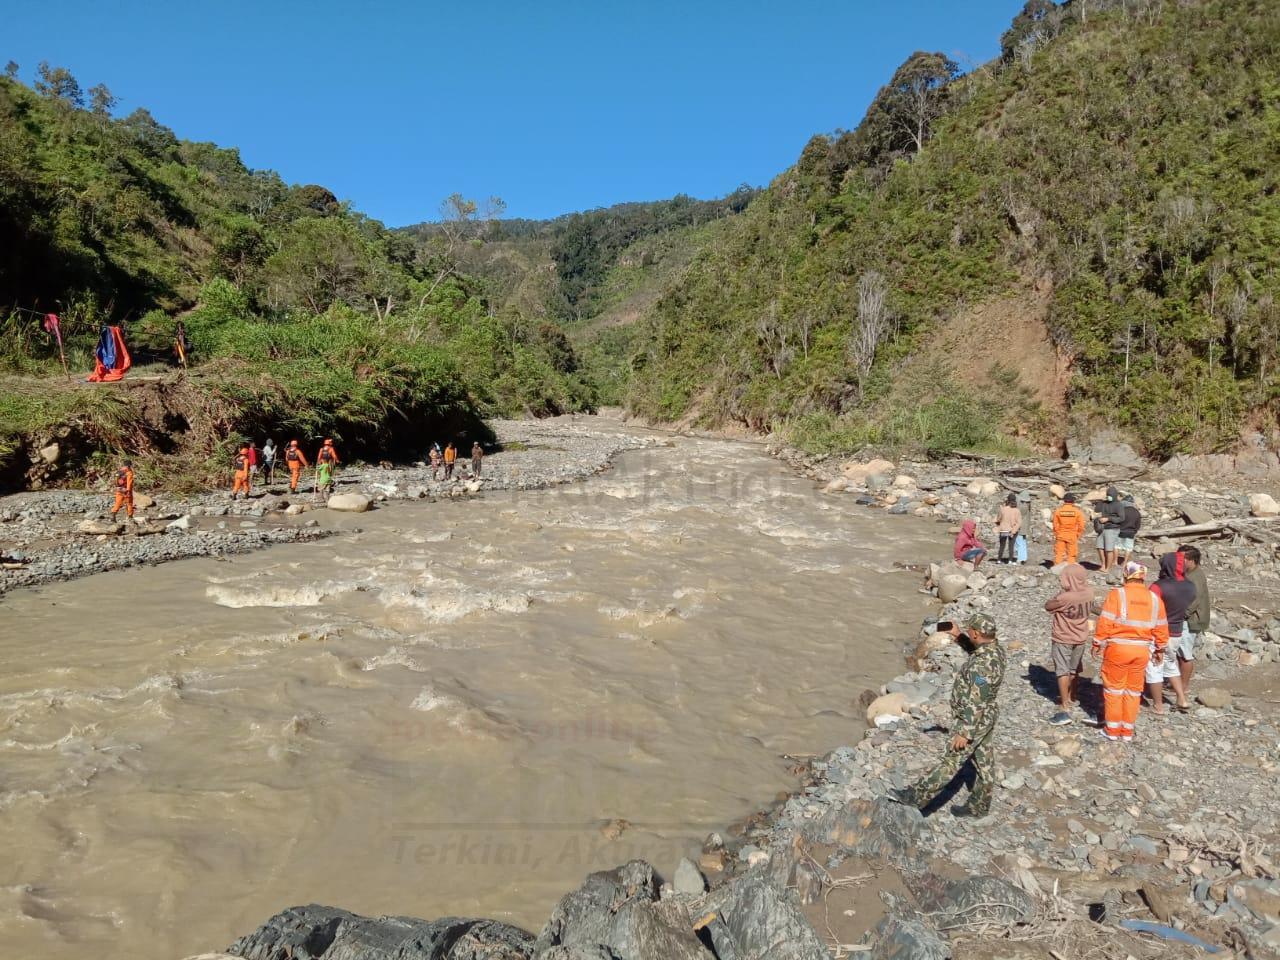 Basarnas Cari Warga Manokwari Terseret Arus di Sungai Didohu 3 IMG 20210315 WA0021